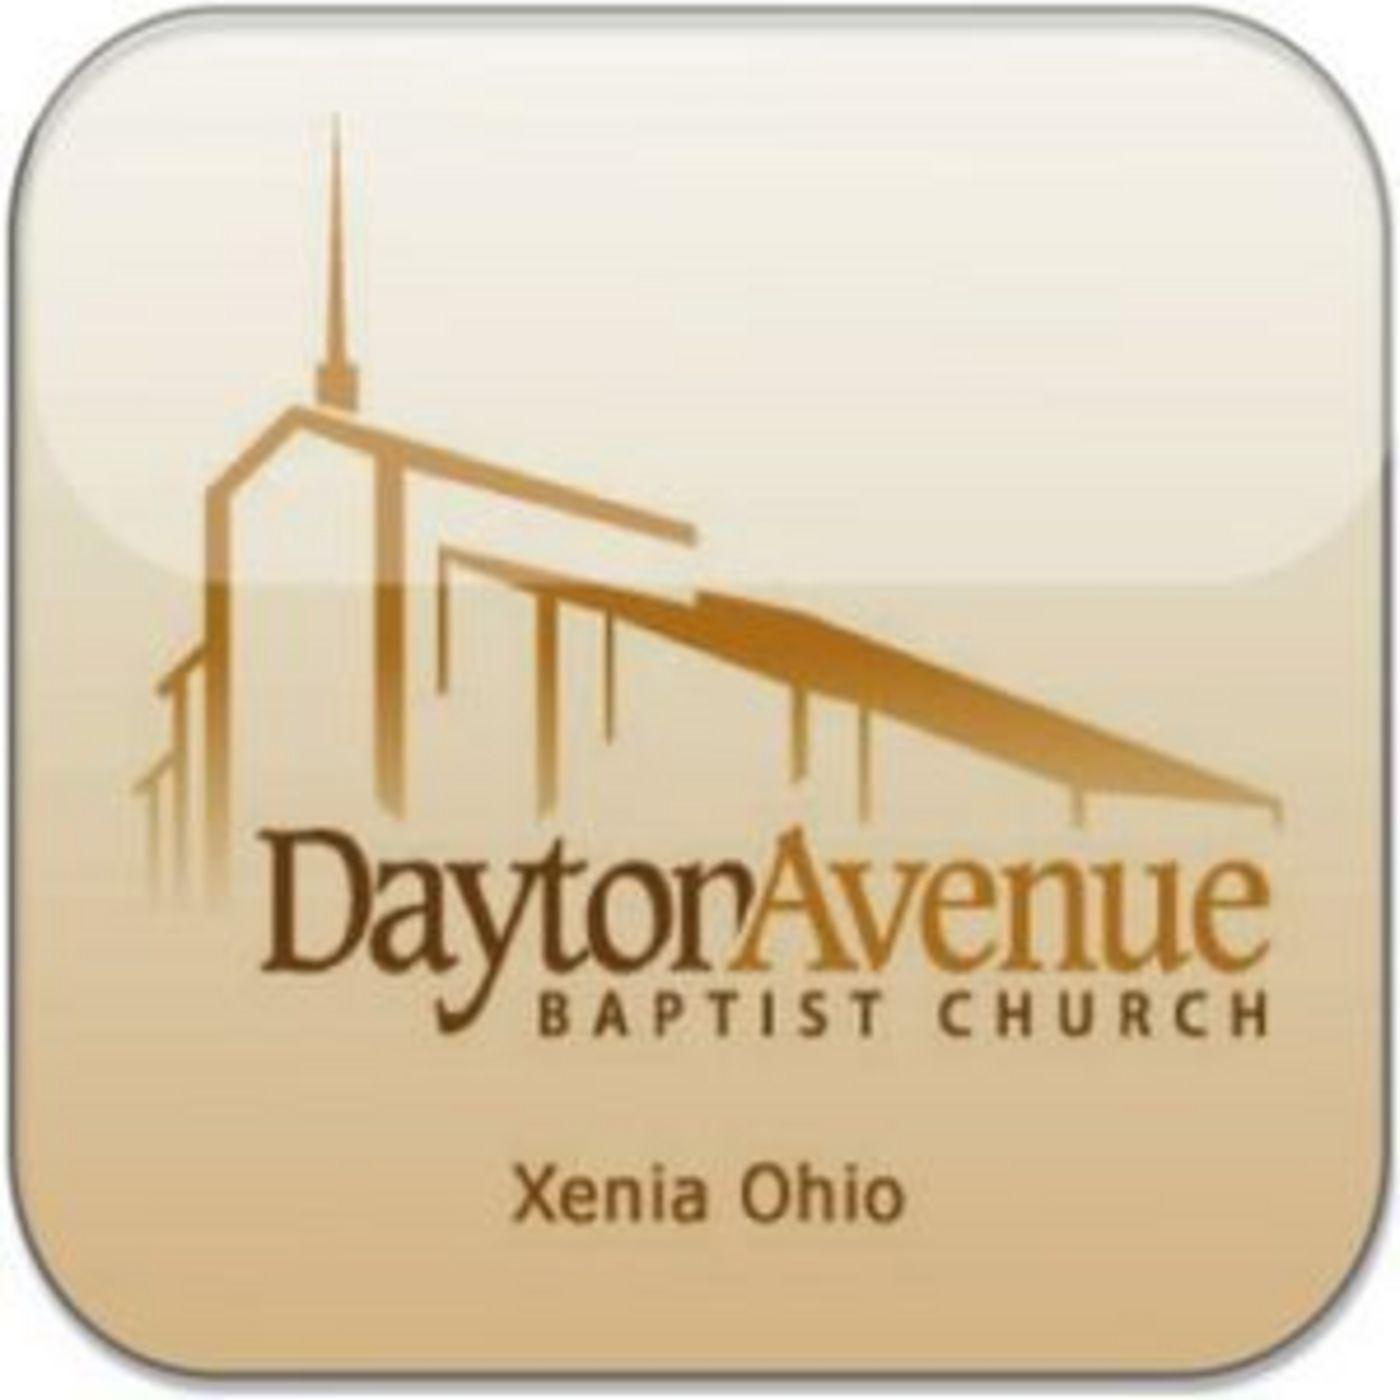 <![CDATA[Dayton Avenue Baptist Church Sermons]]>